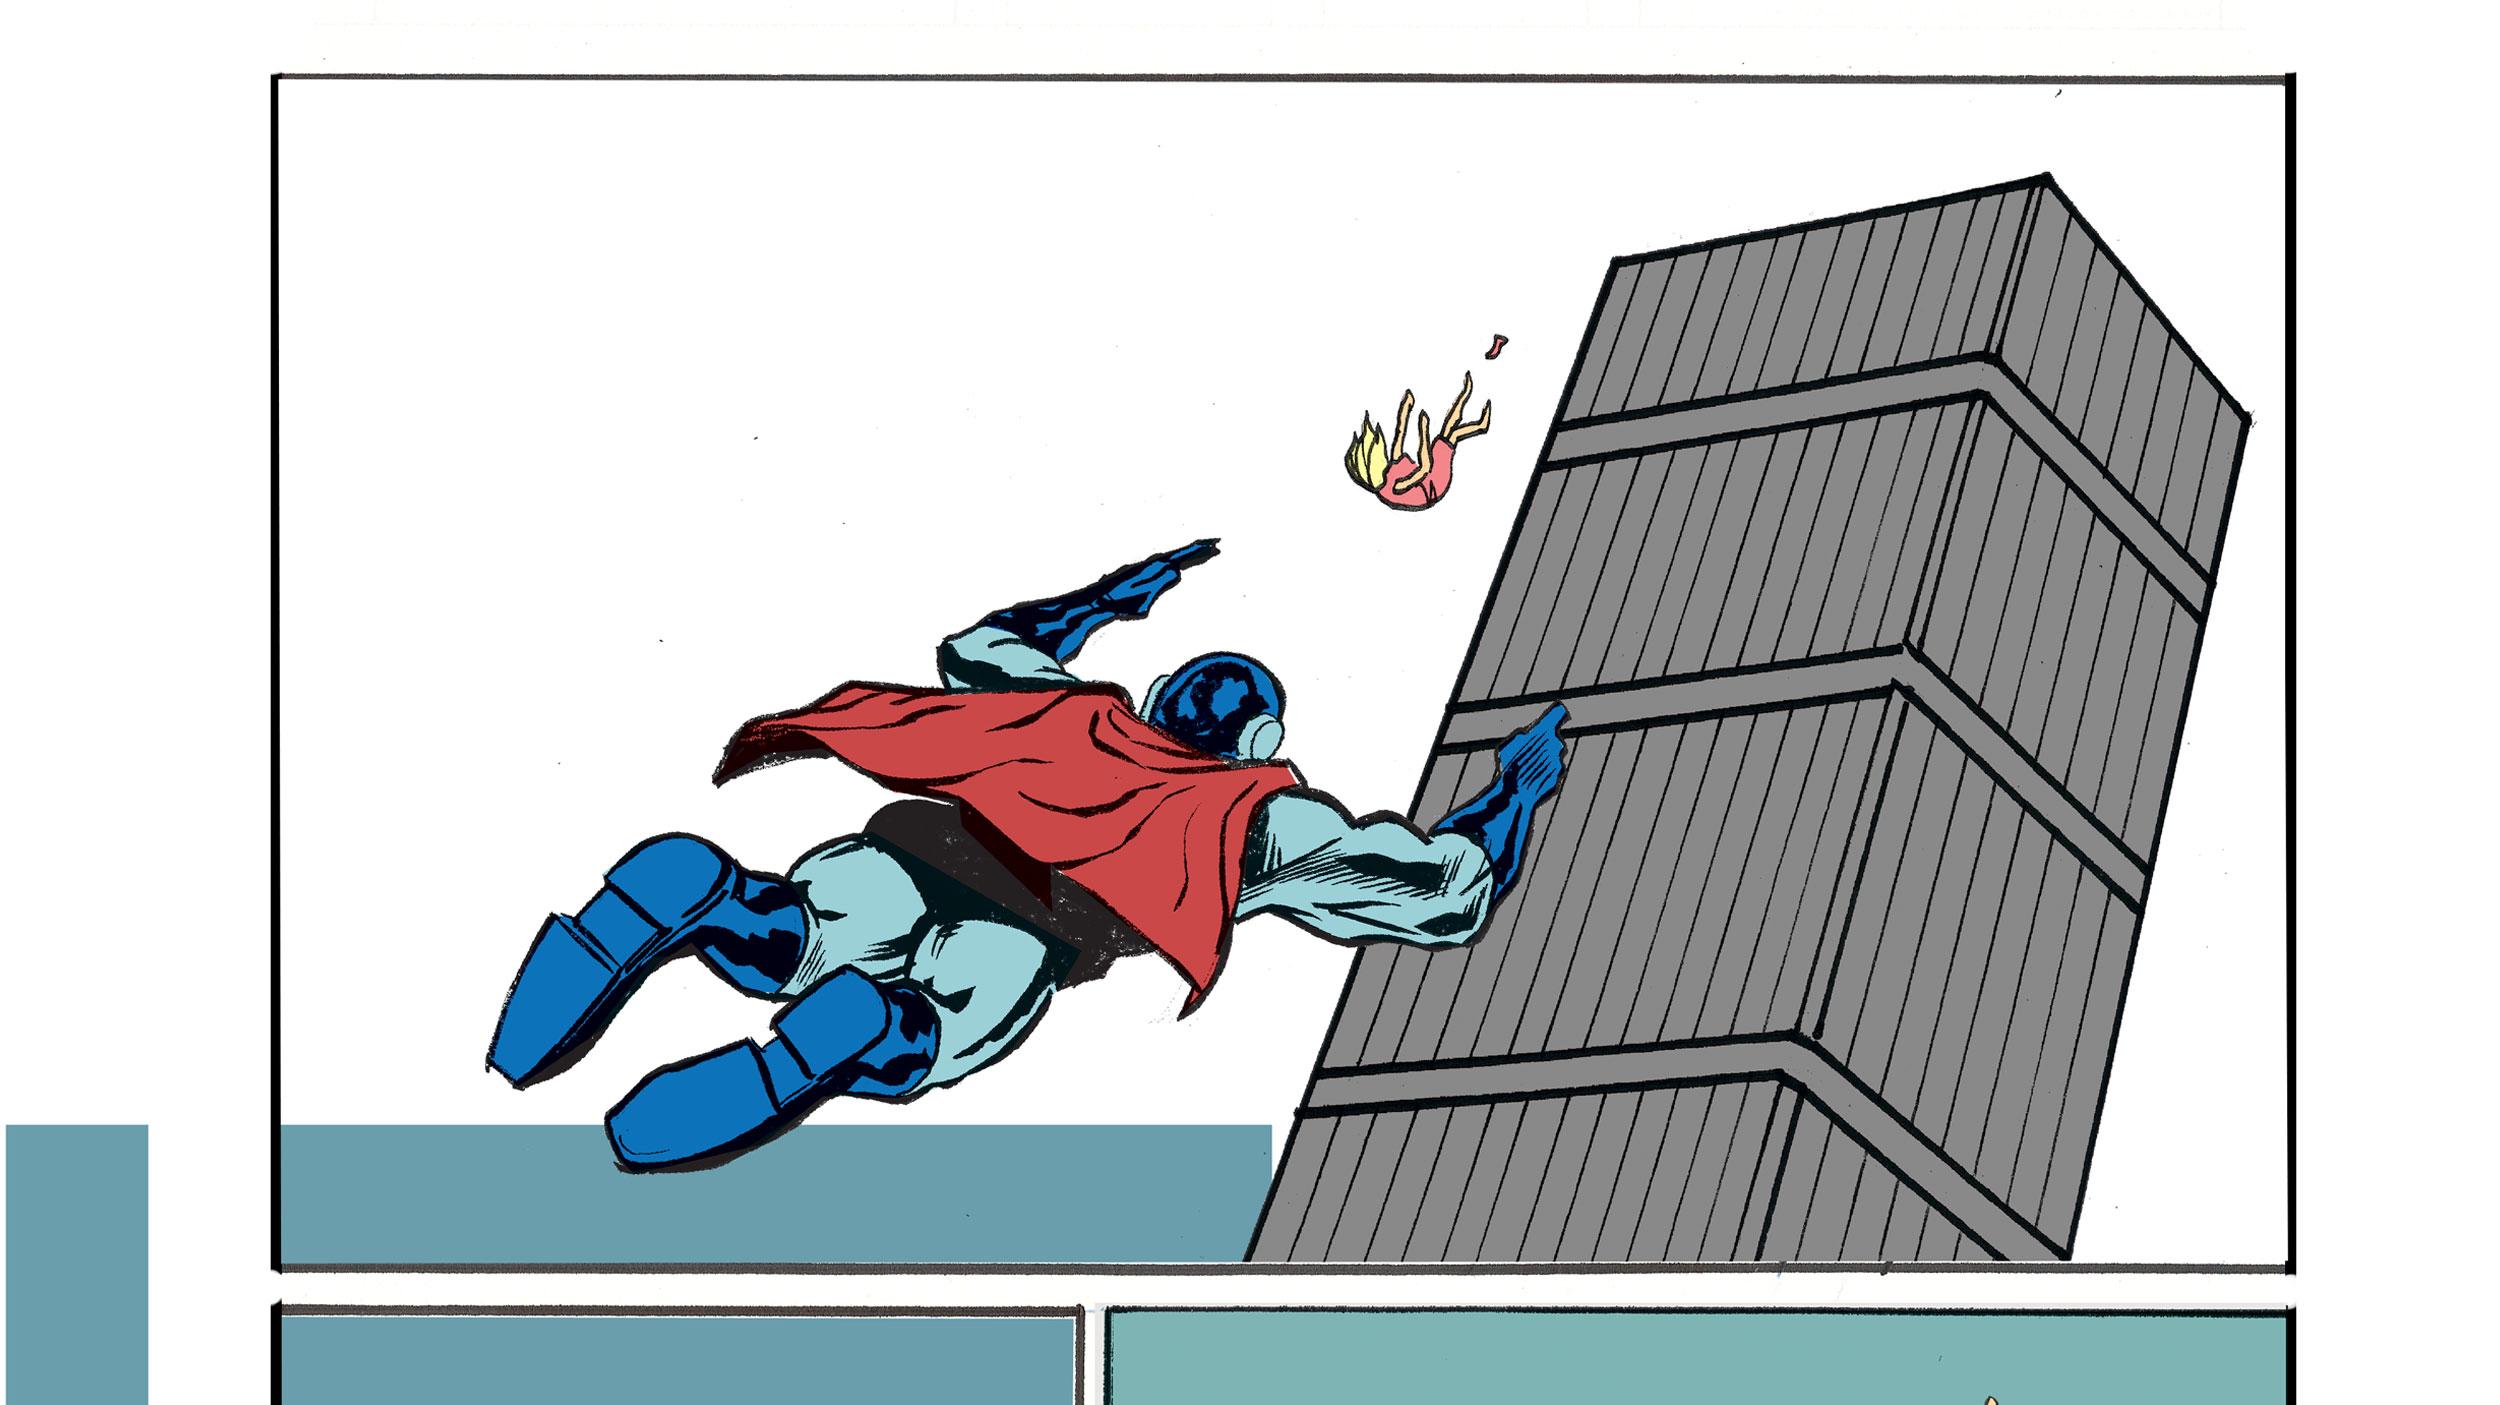 ted-joy-lin-superhero-strength-cognitive-04.jpg